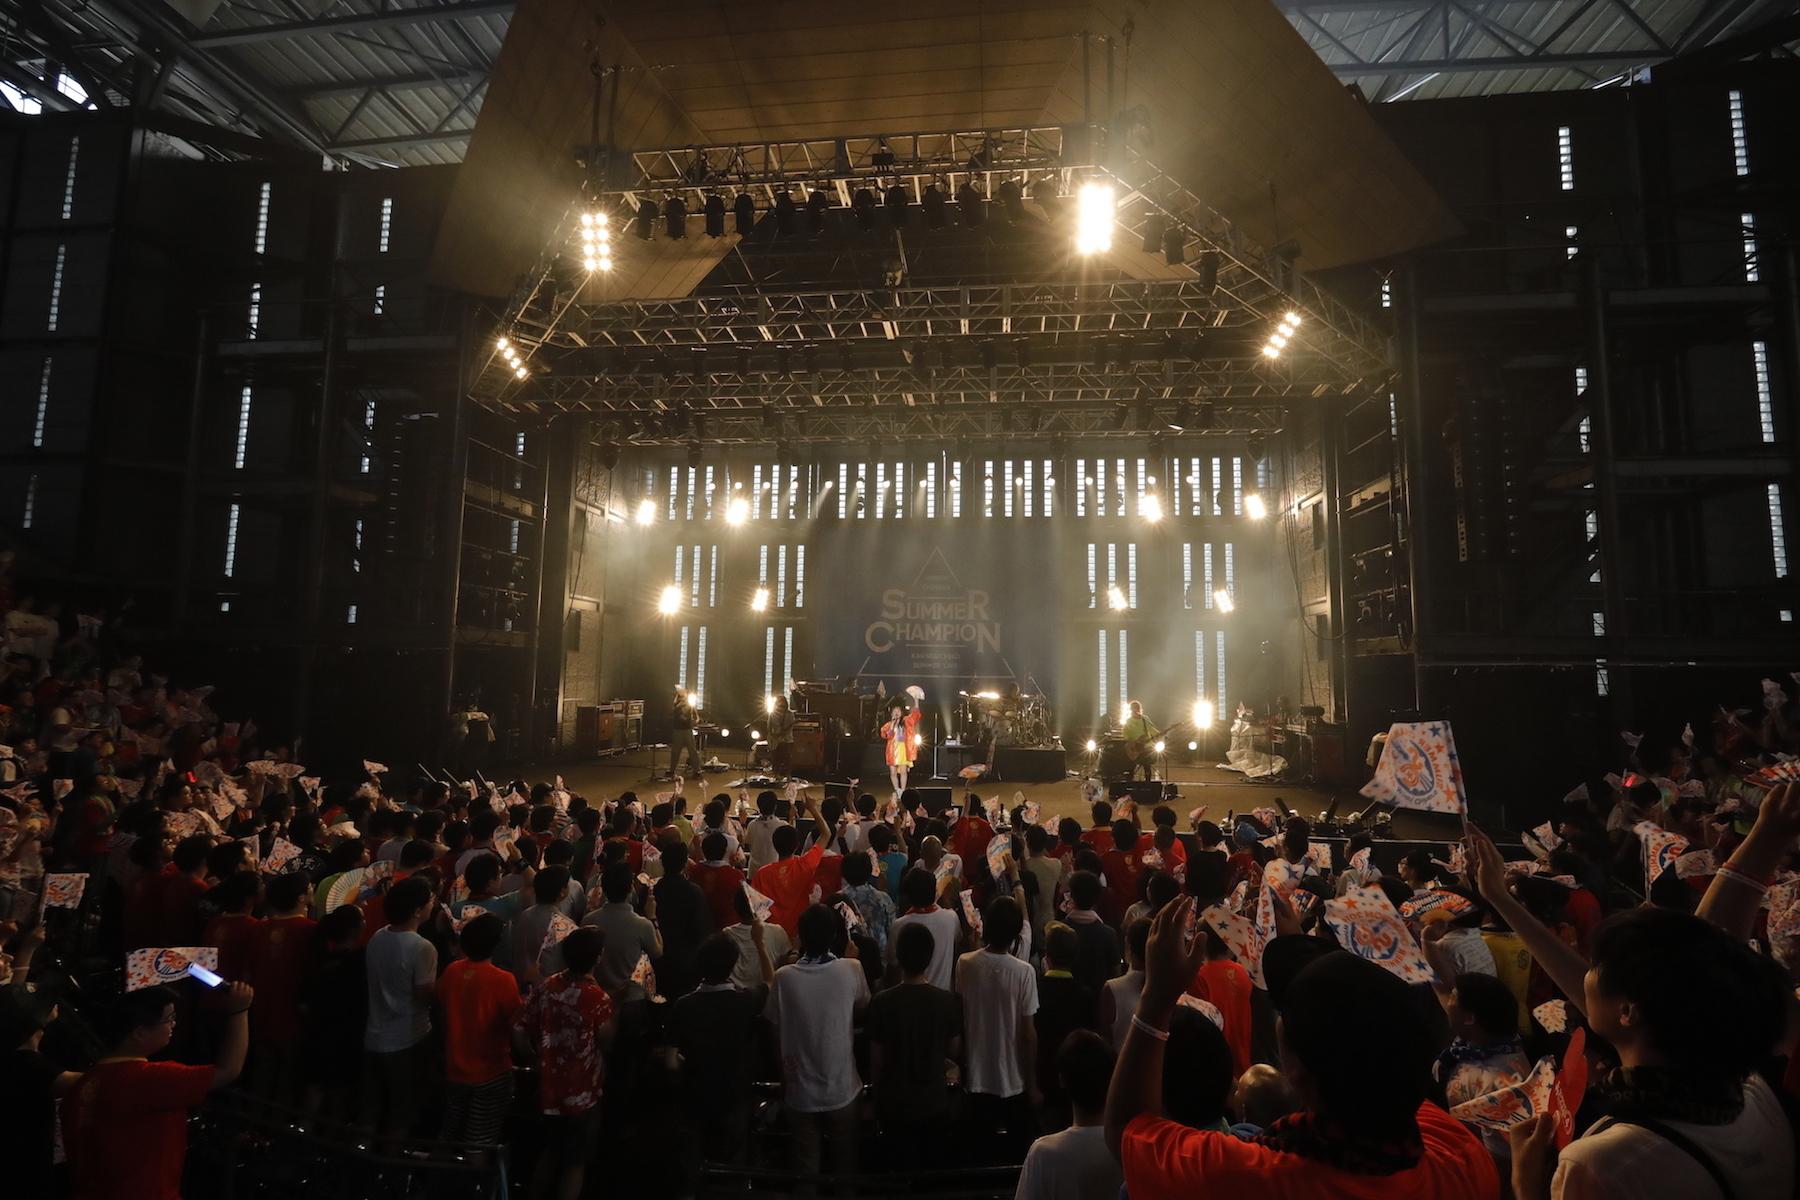 『SUMMER CHAMPION2019〜Minori Chihara 11th Summer Live〜』photo by 草刈雅之